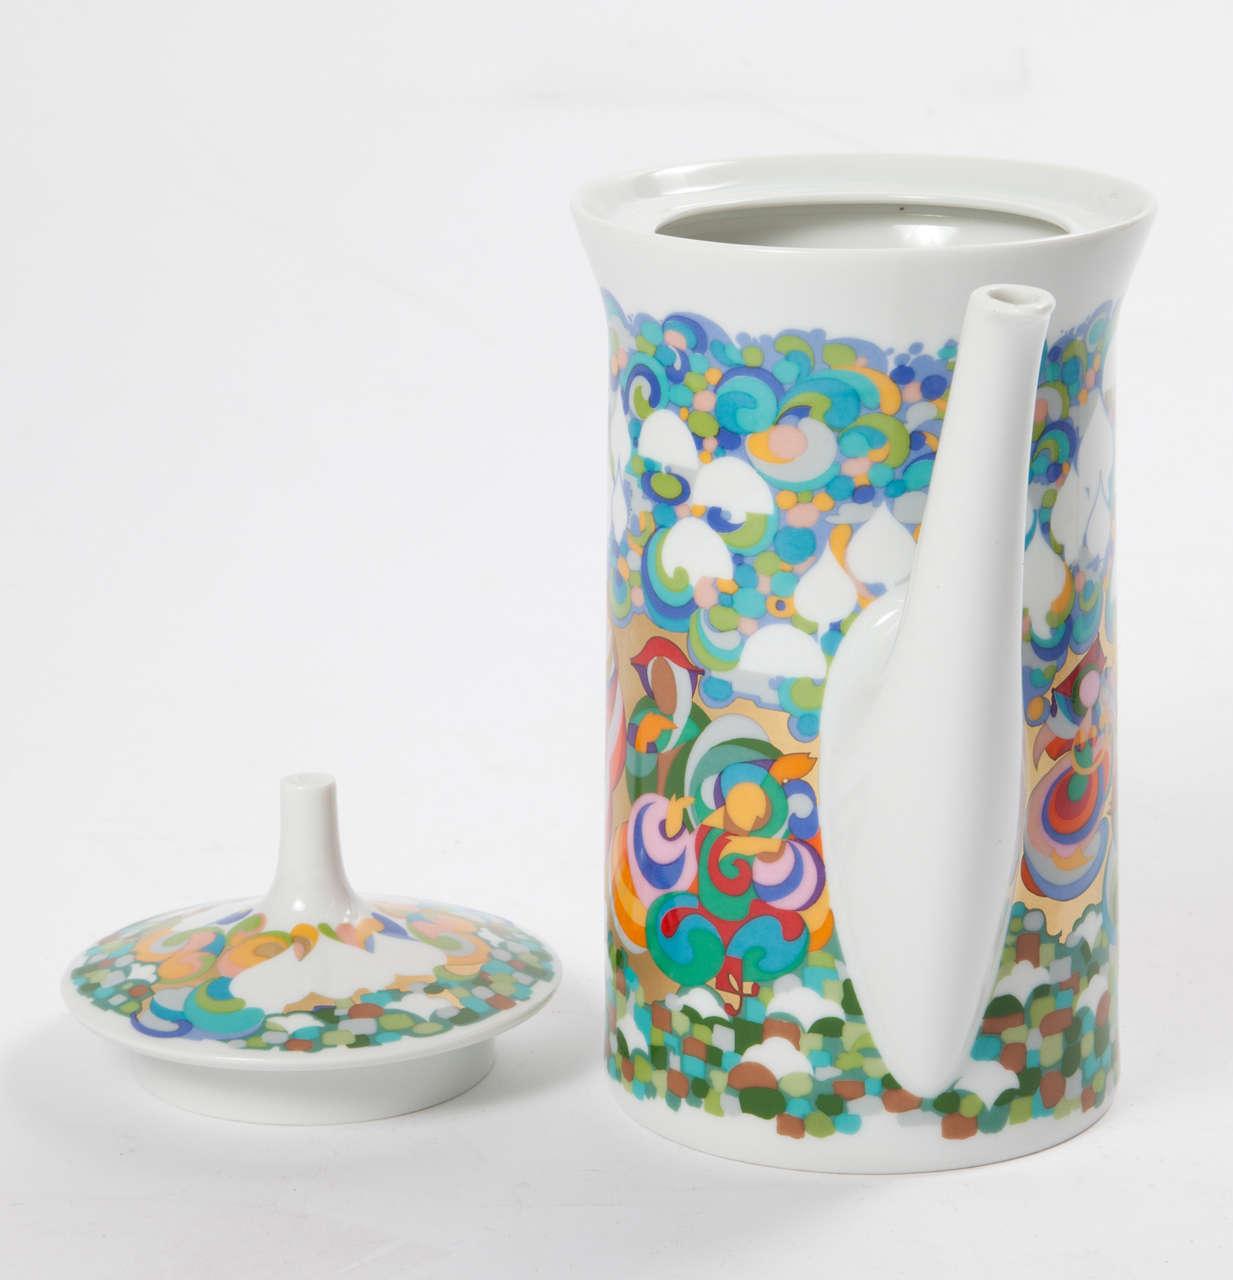 Rosenthal Bjorn Wiinblad Teapot For Sale 1